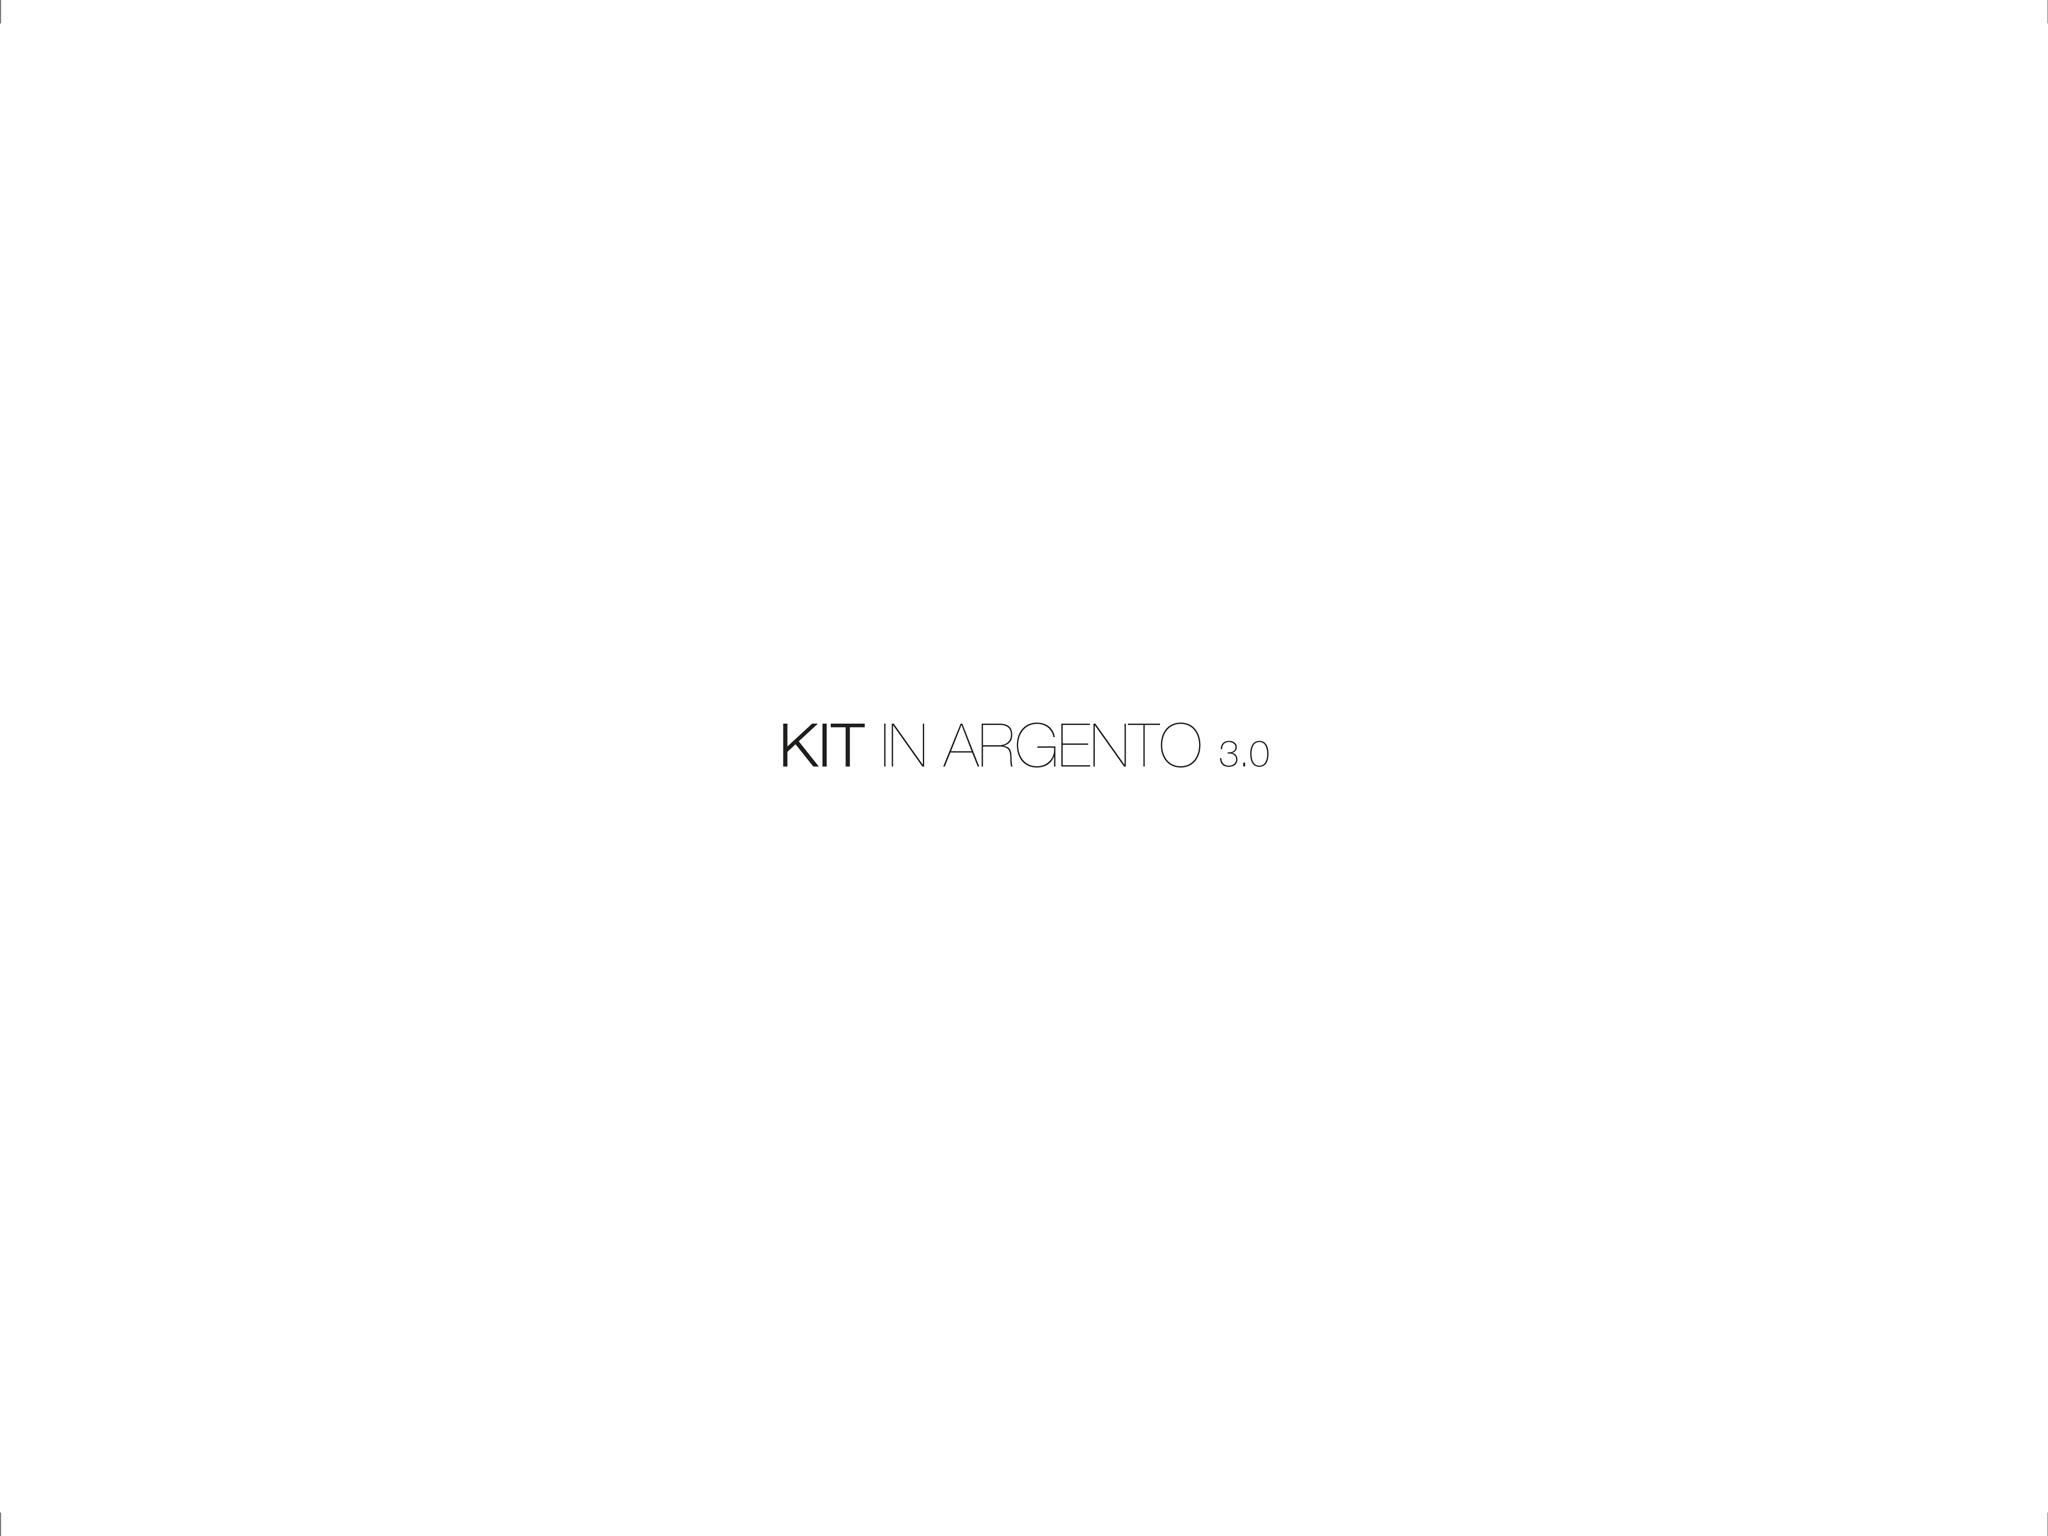 kit_argento_3.0_2016_pagina_2_APP